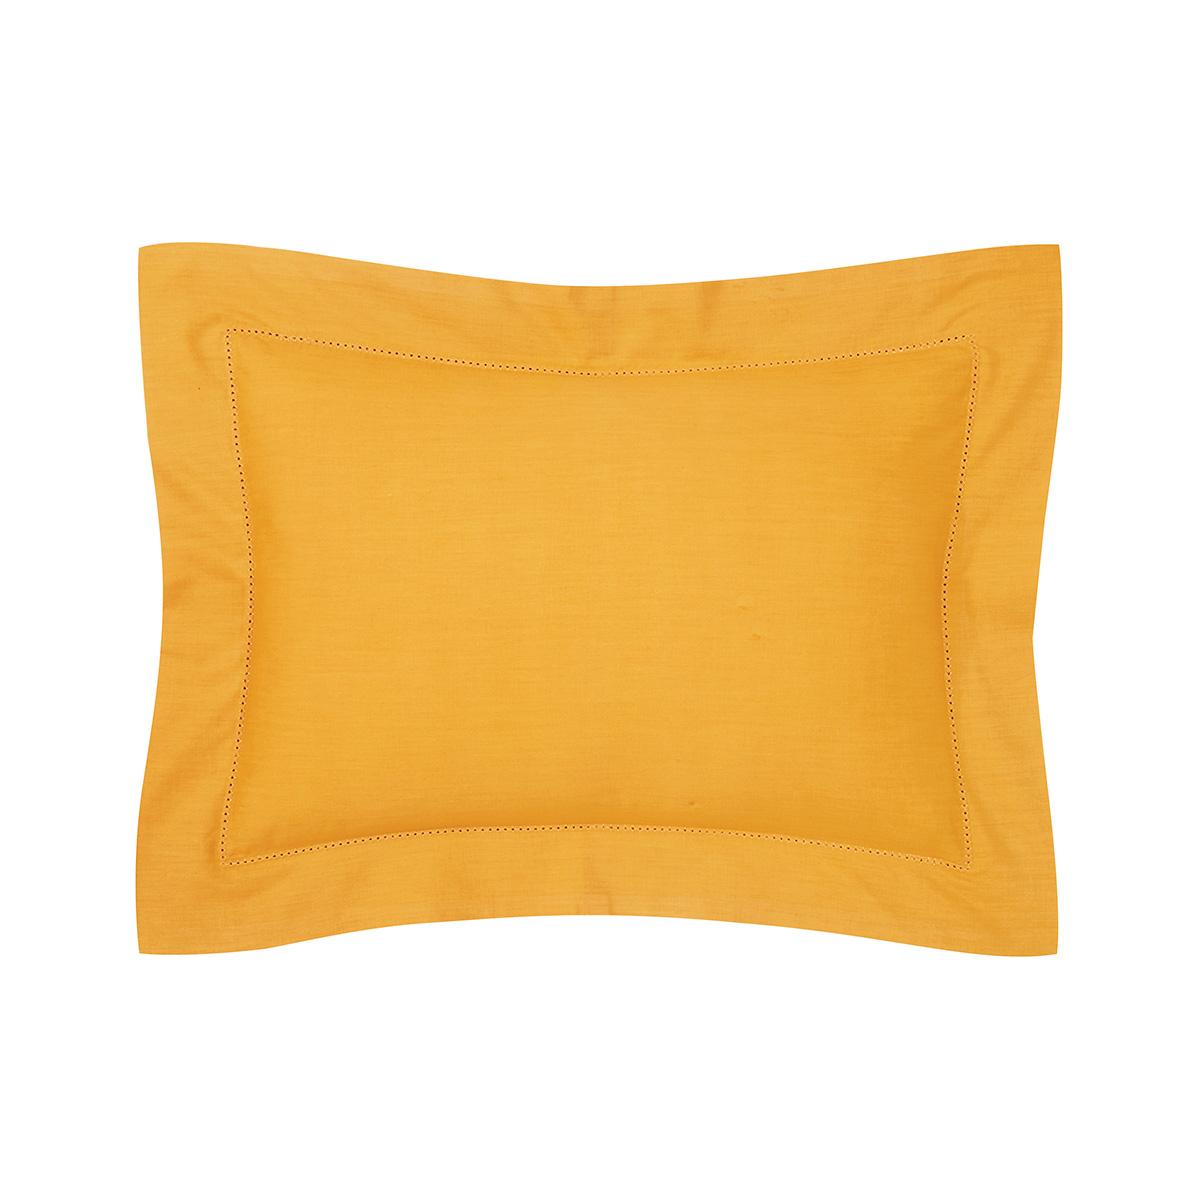 Taie d'oreiller percale Orange 30 x 40 cm